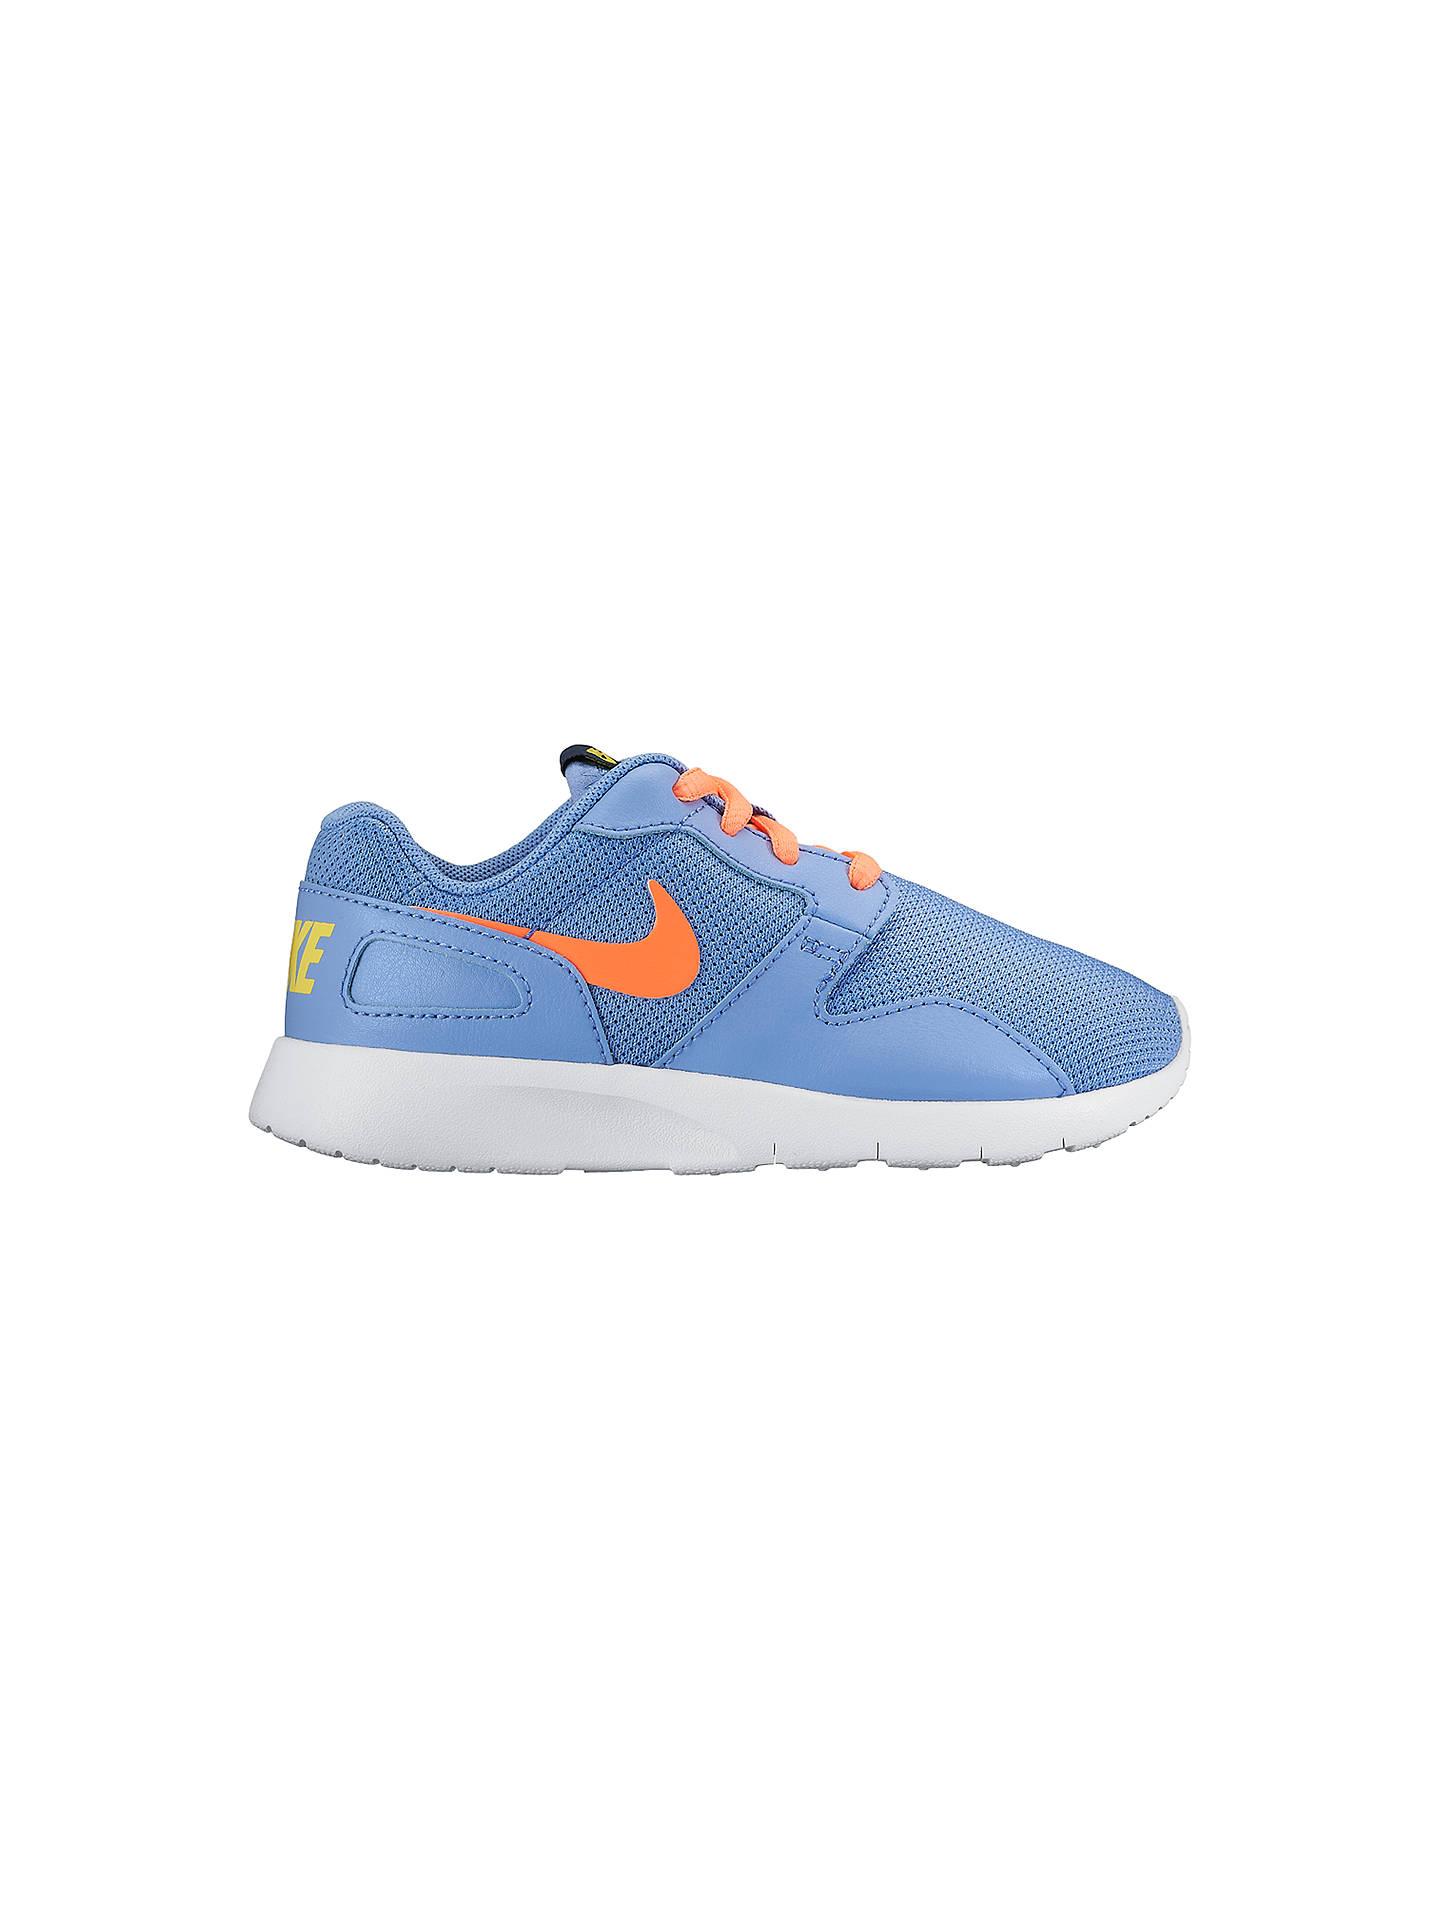 sale retailer 6f4fe fa5d3 ... order buynike kaishi sports trainers blue orange 5 online at johnlewis  83bb1 5b914